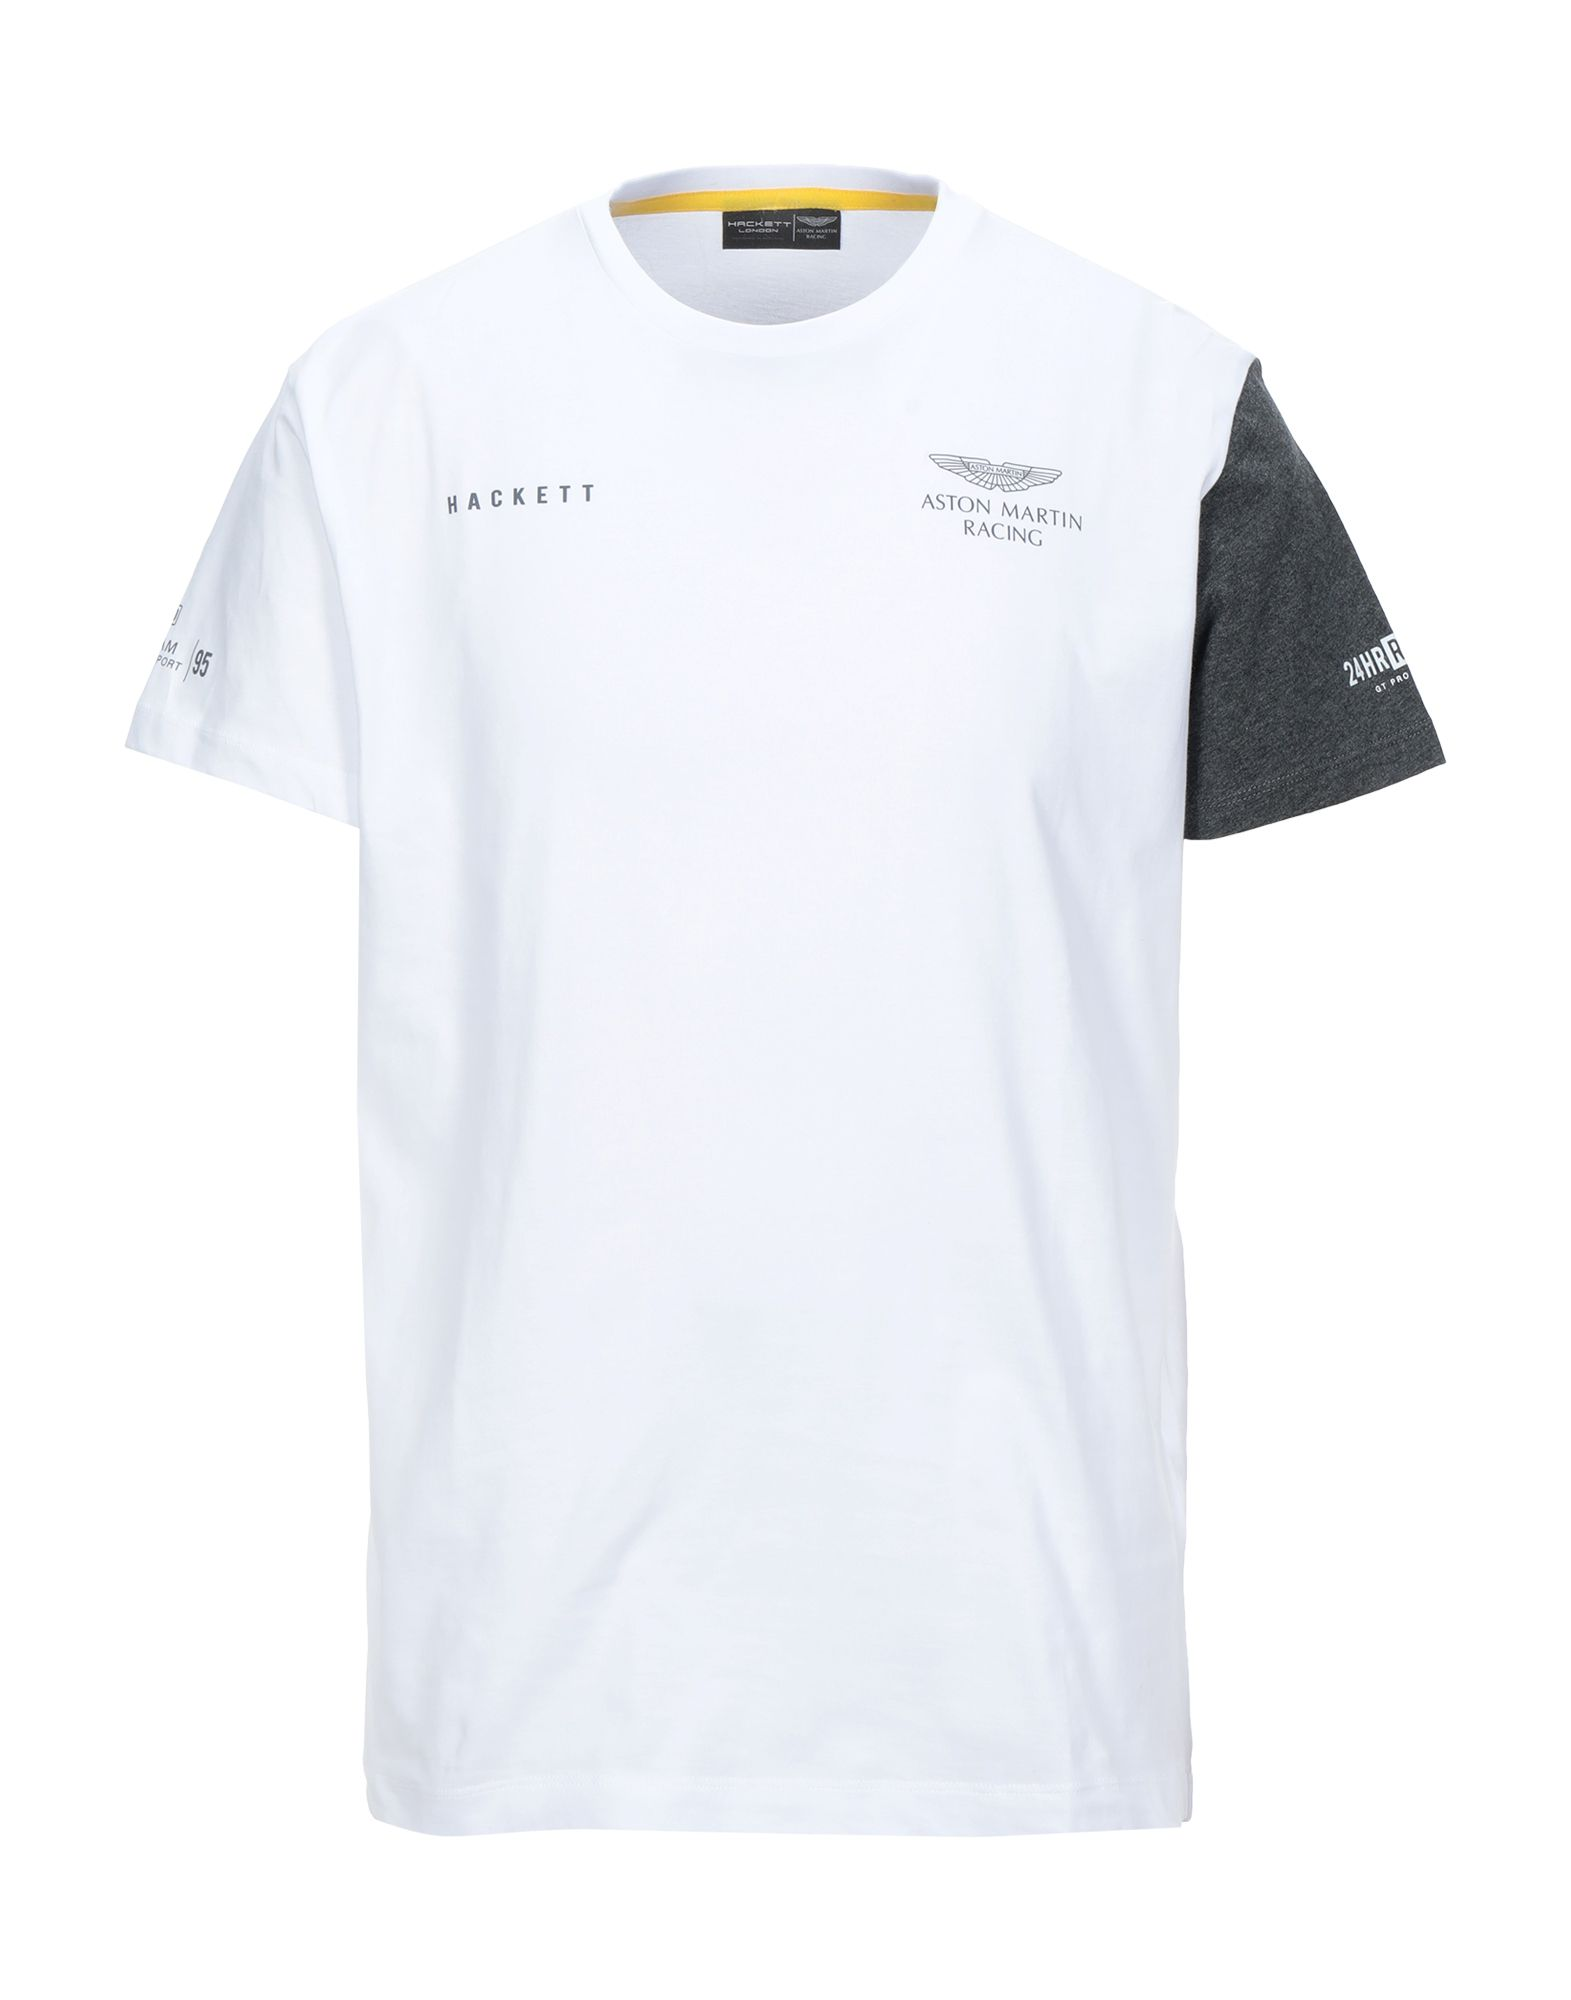 ASTON MARTIN RACING by HACKETT Футболка футболка aston martin футболка